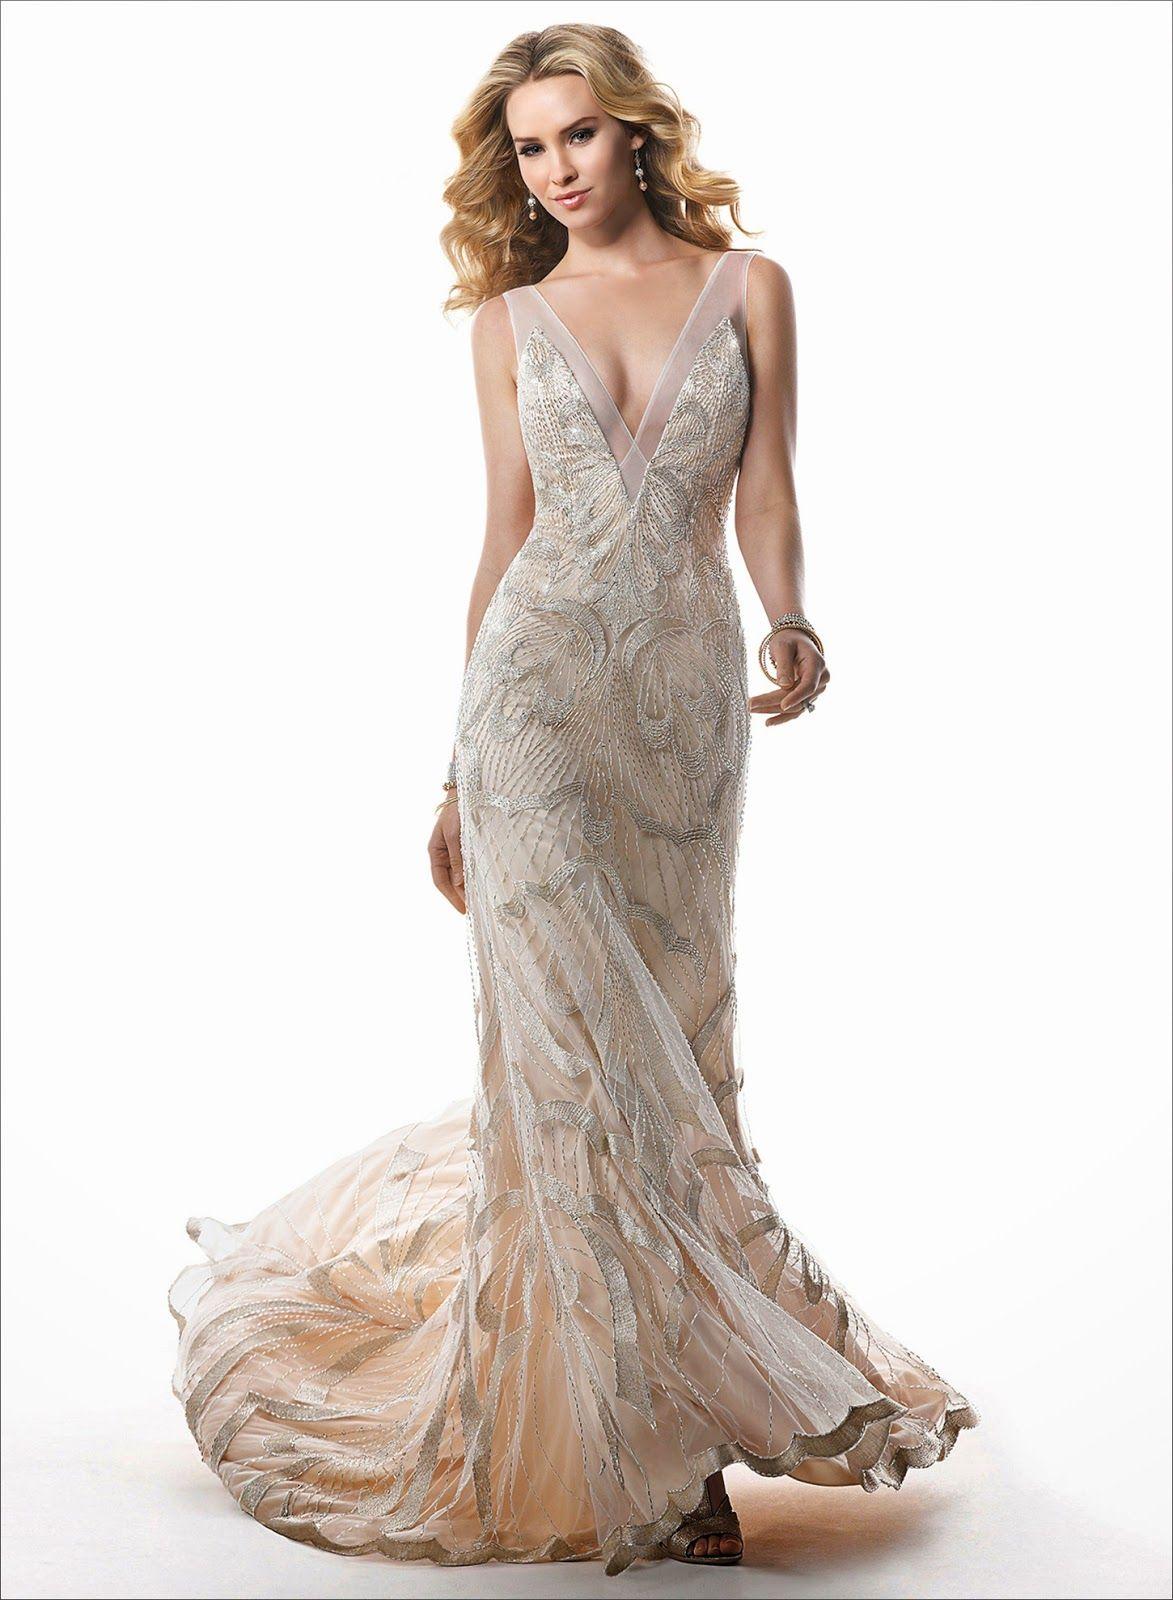 1920 wedding dress  beaded  wedding dresses  Google Search  wedding  Pinterest